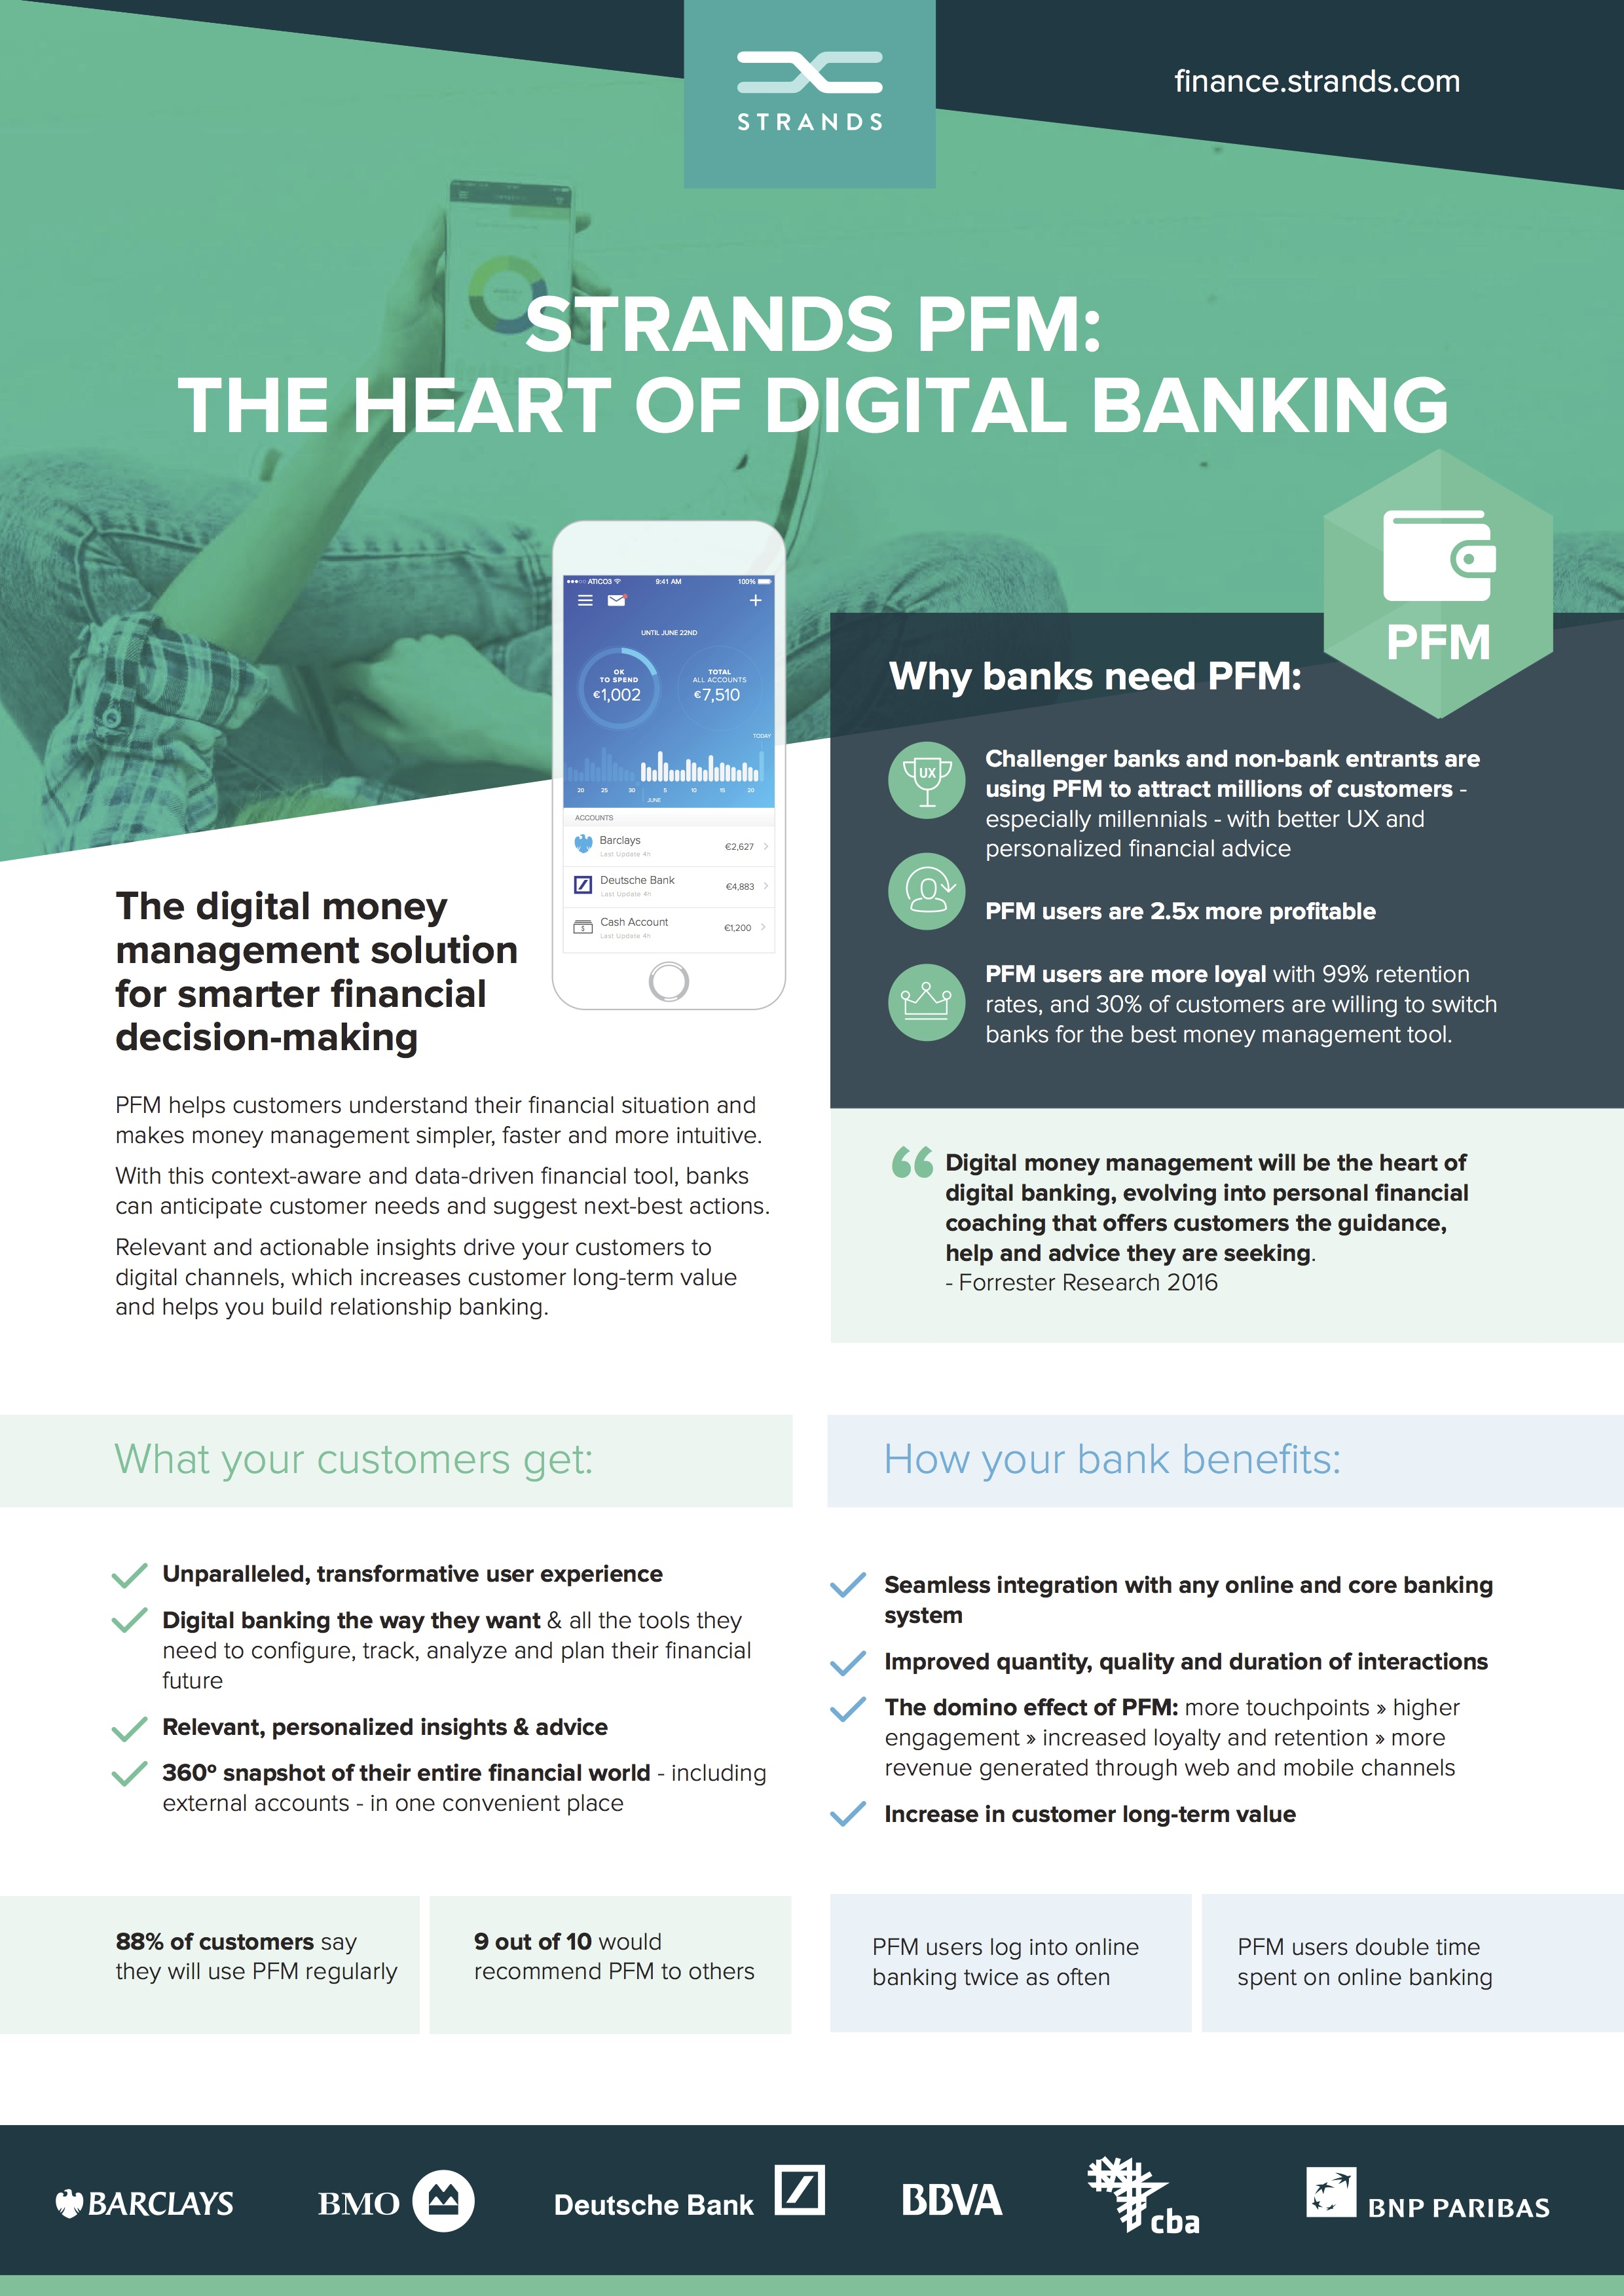 Aib Personal Banking